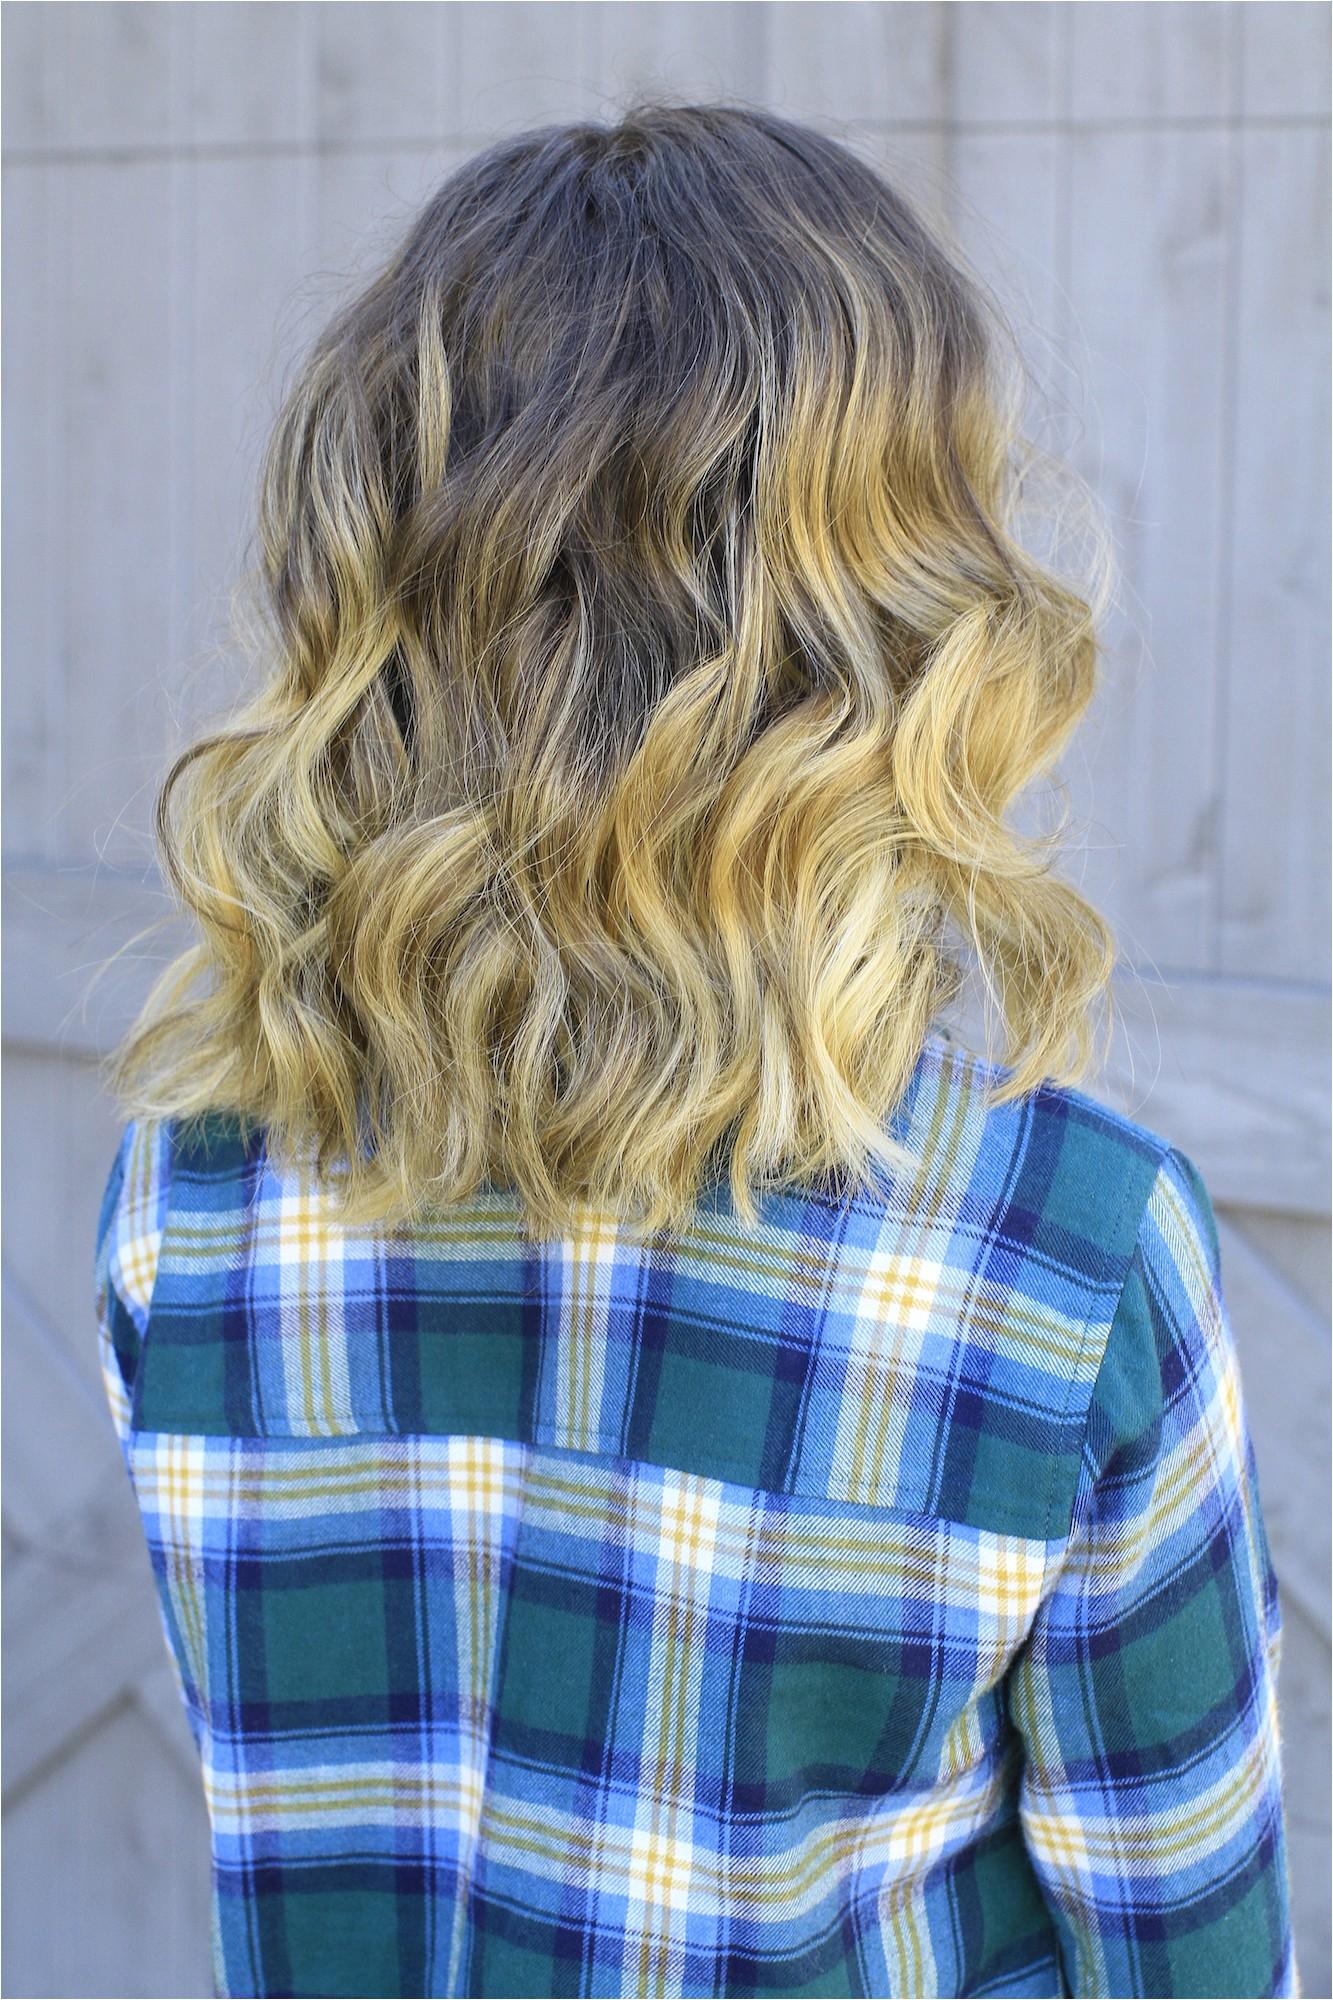 baileys 25mm wand curls